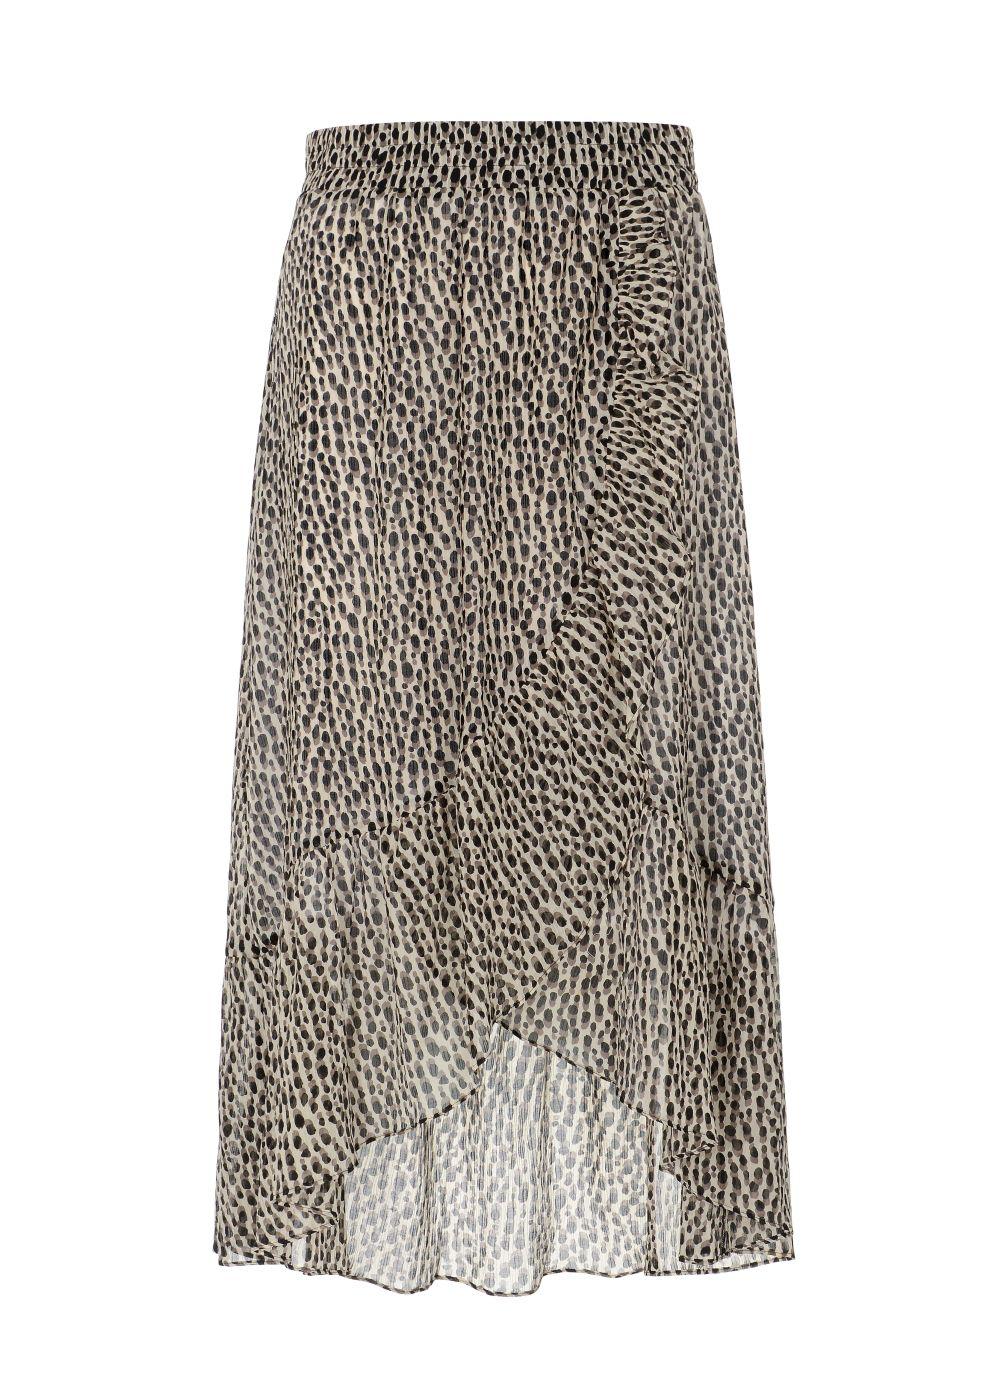 Spódnica damska SPCDT-0041-81(W21)